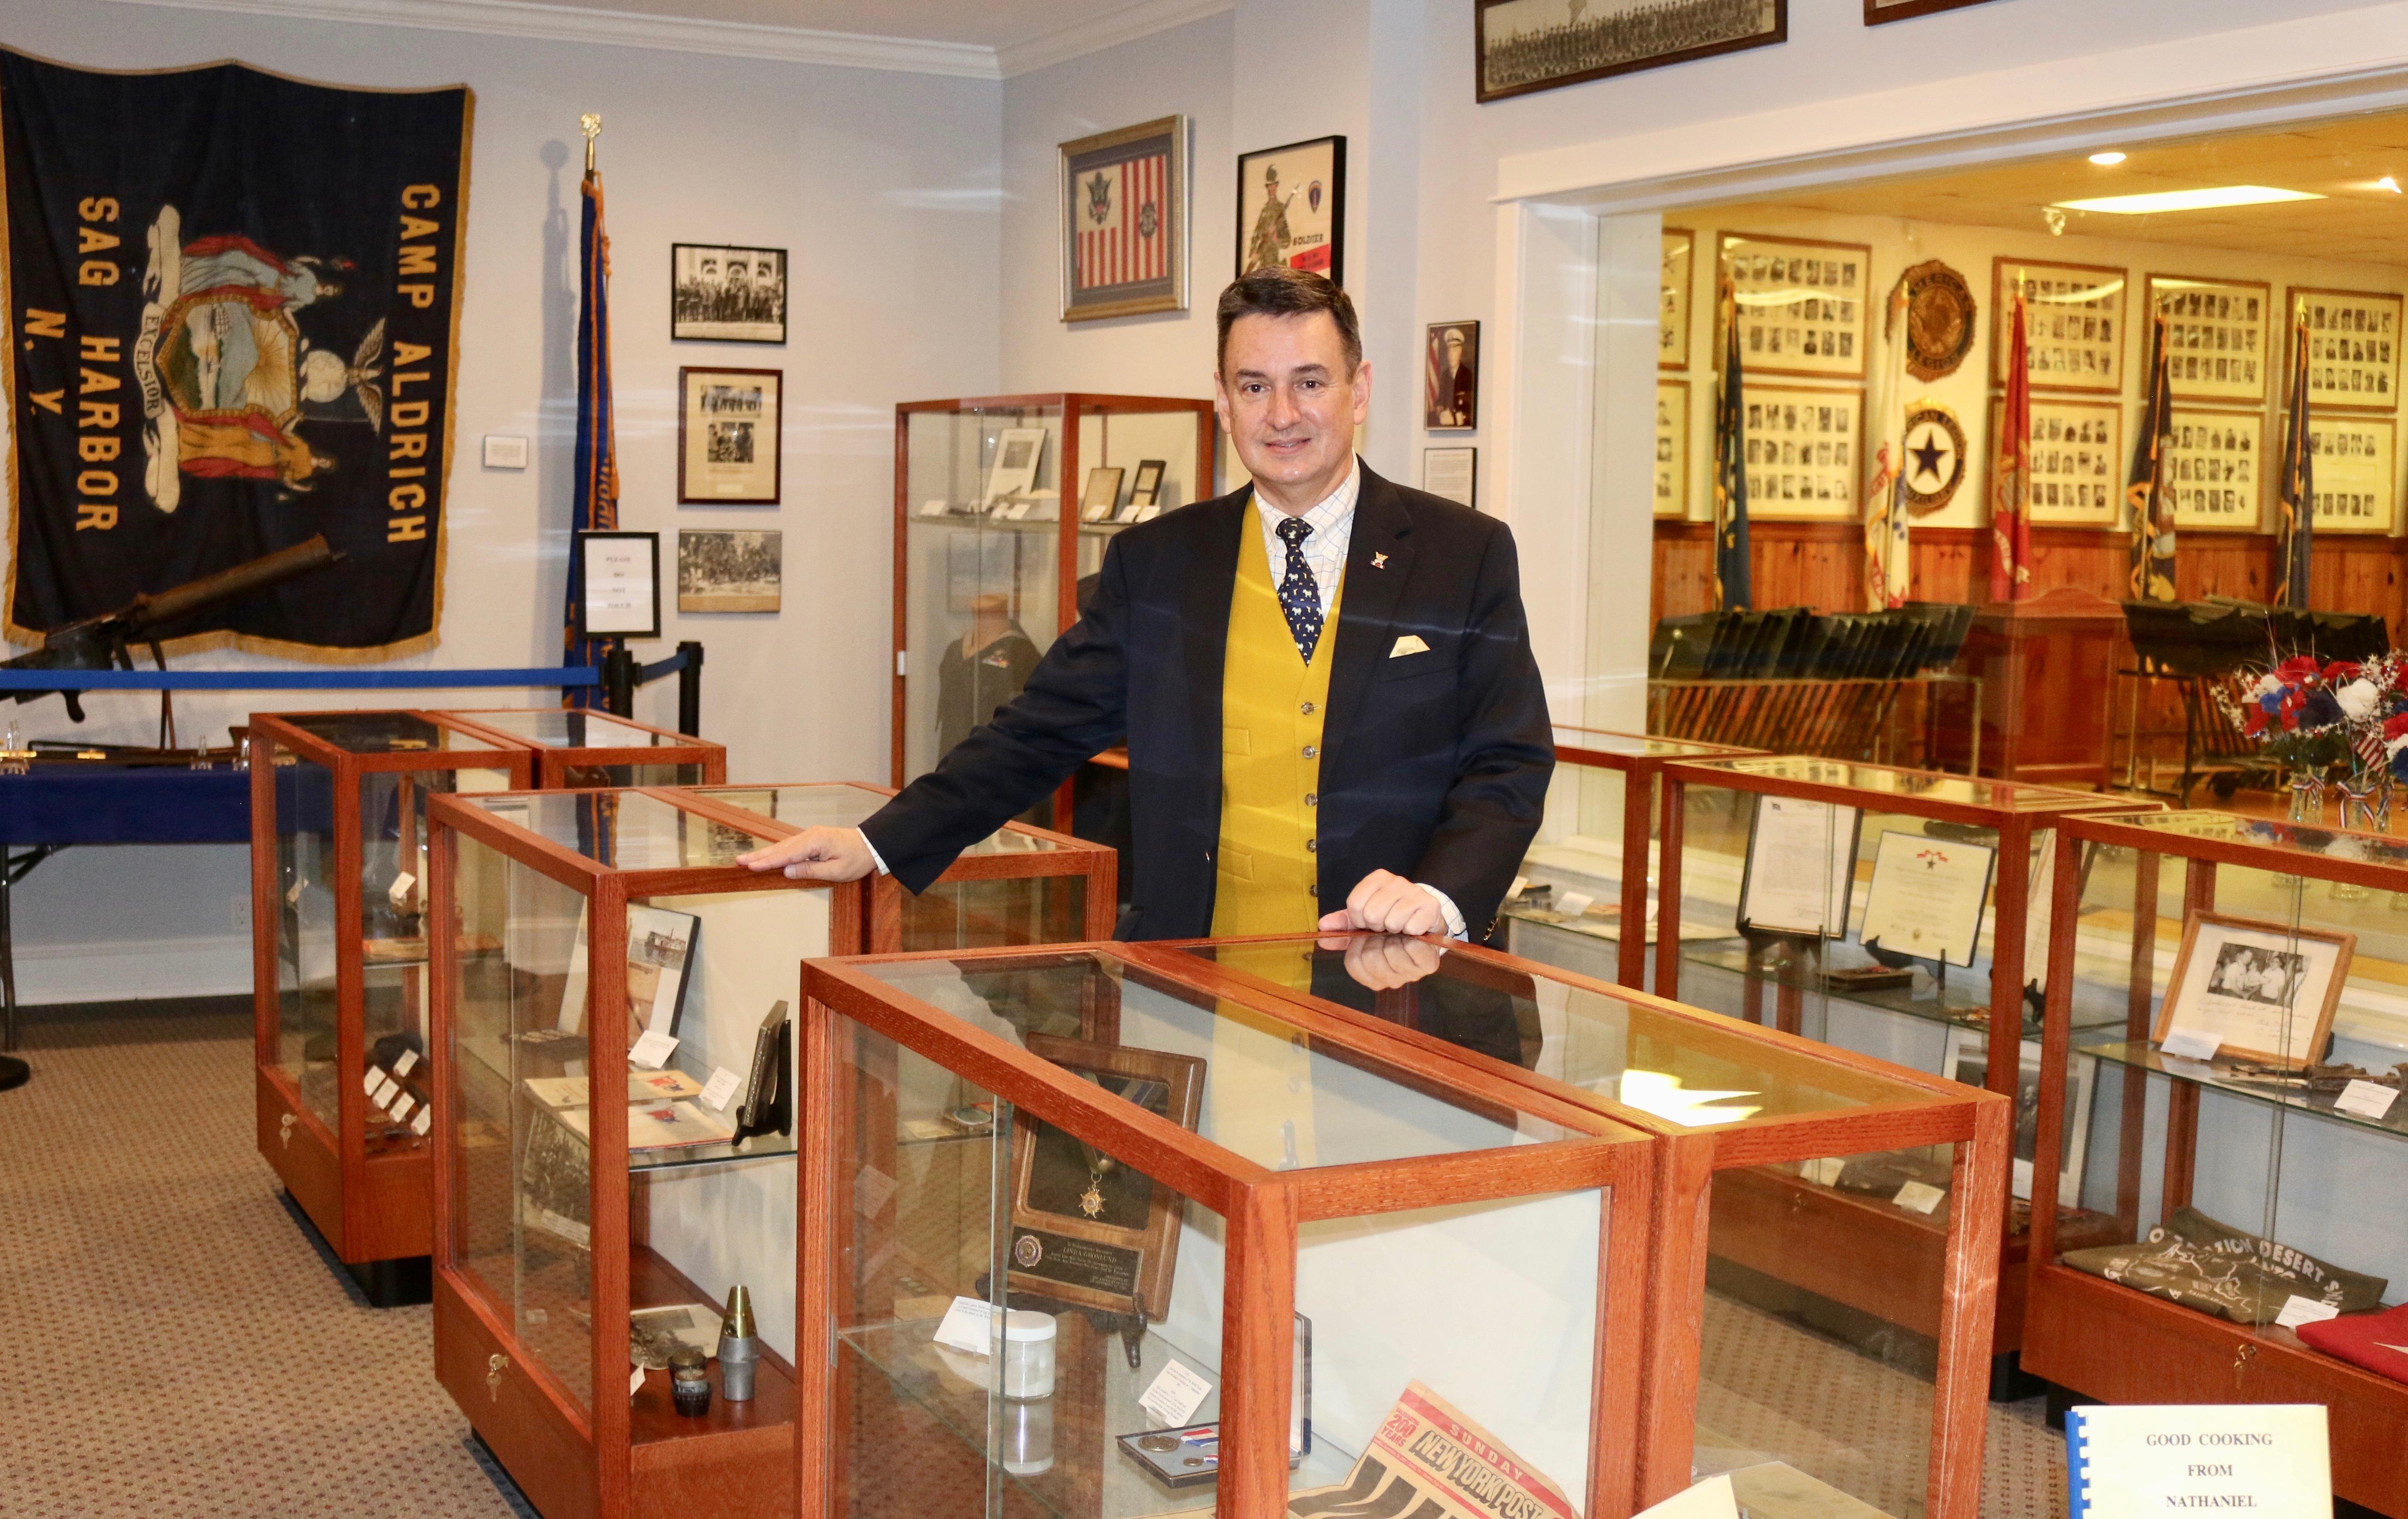 Curator Paul Gerecke at the Sag Harbor American Legion Post's soon-to-open military memorabilia exhibit room.